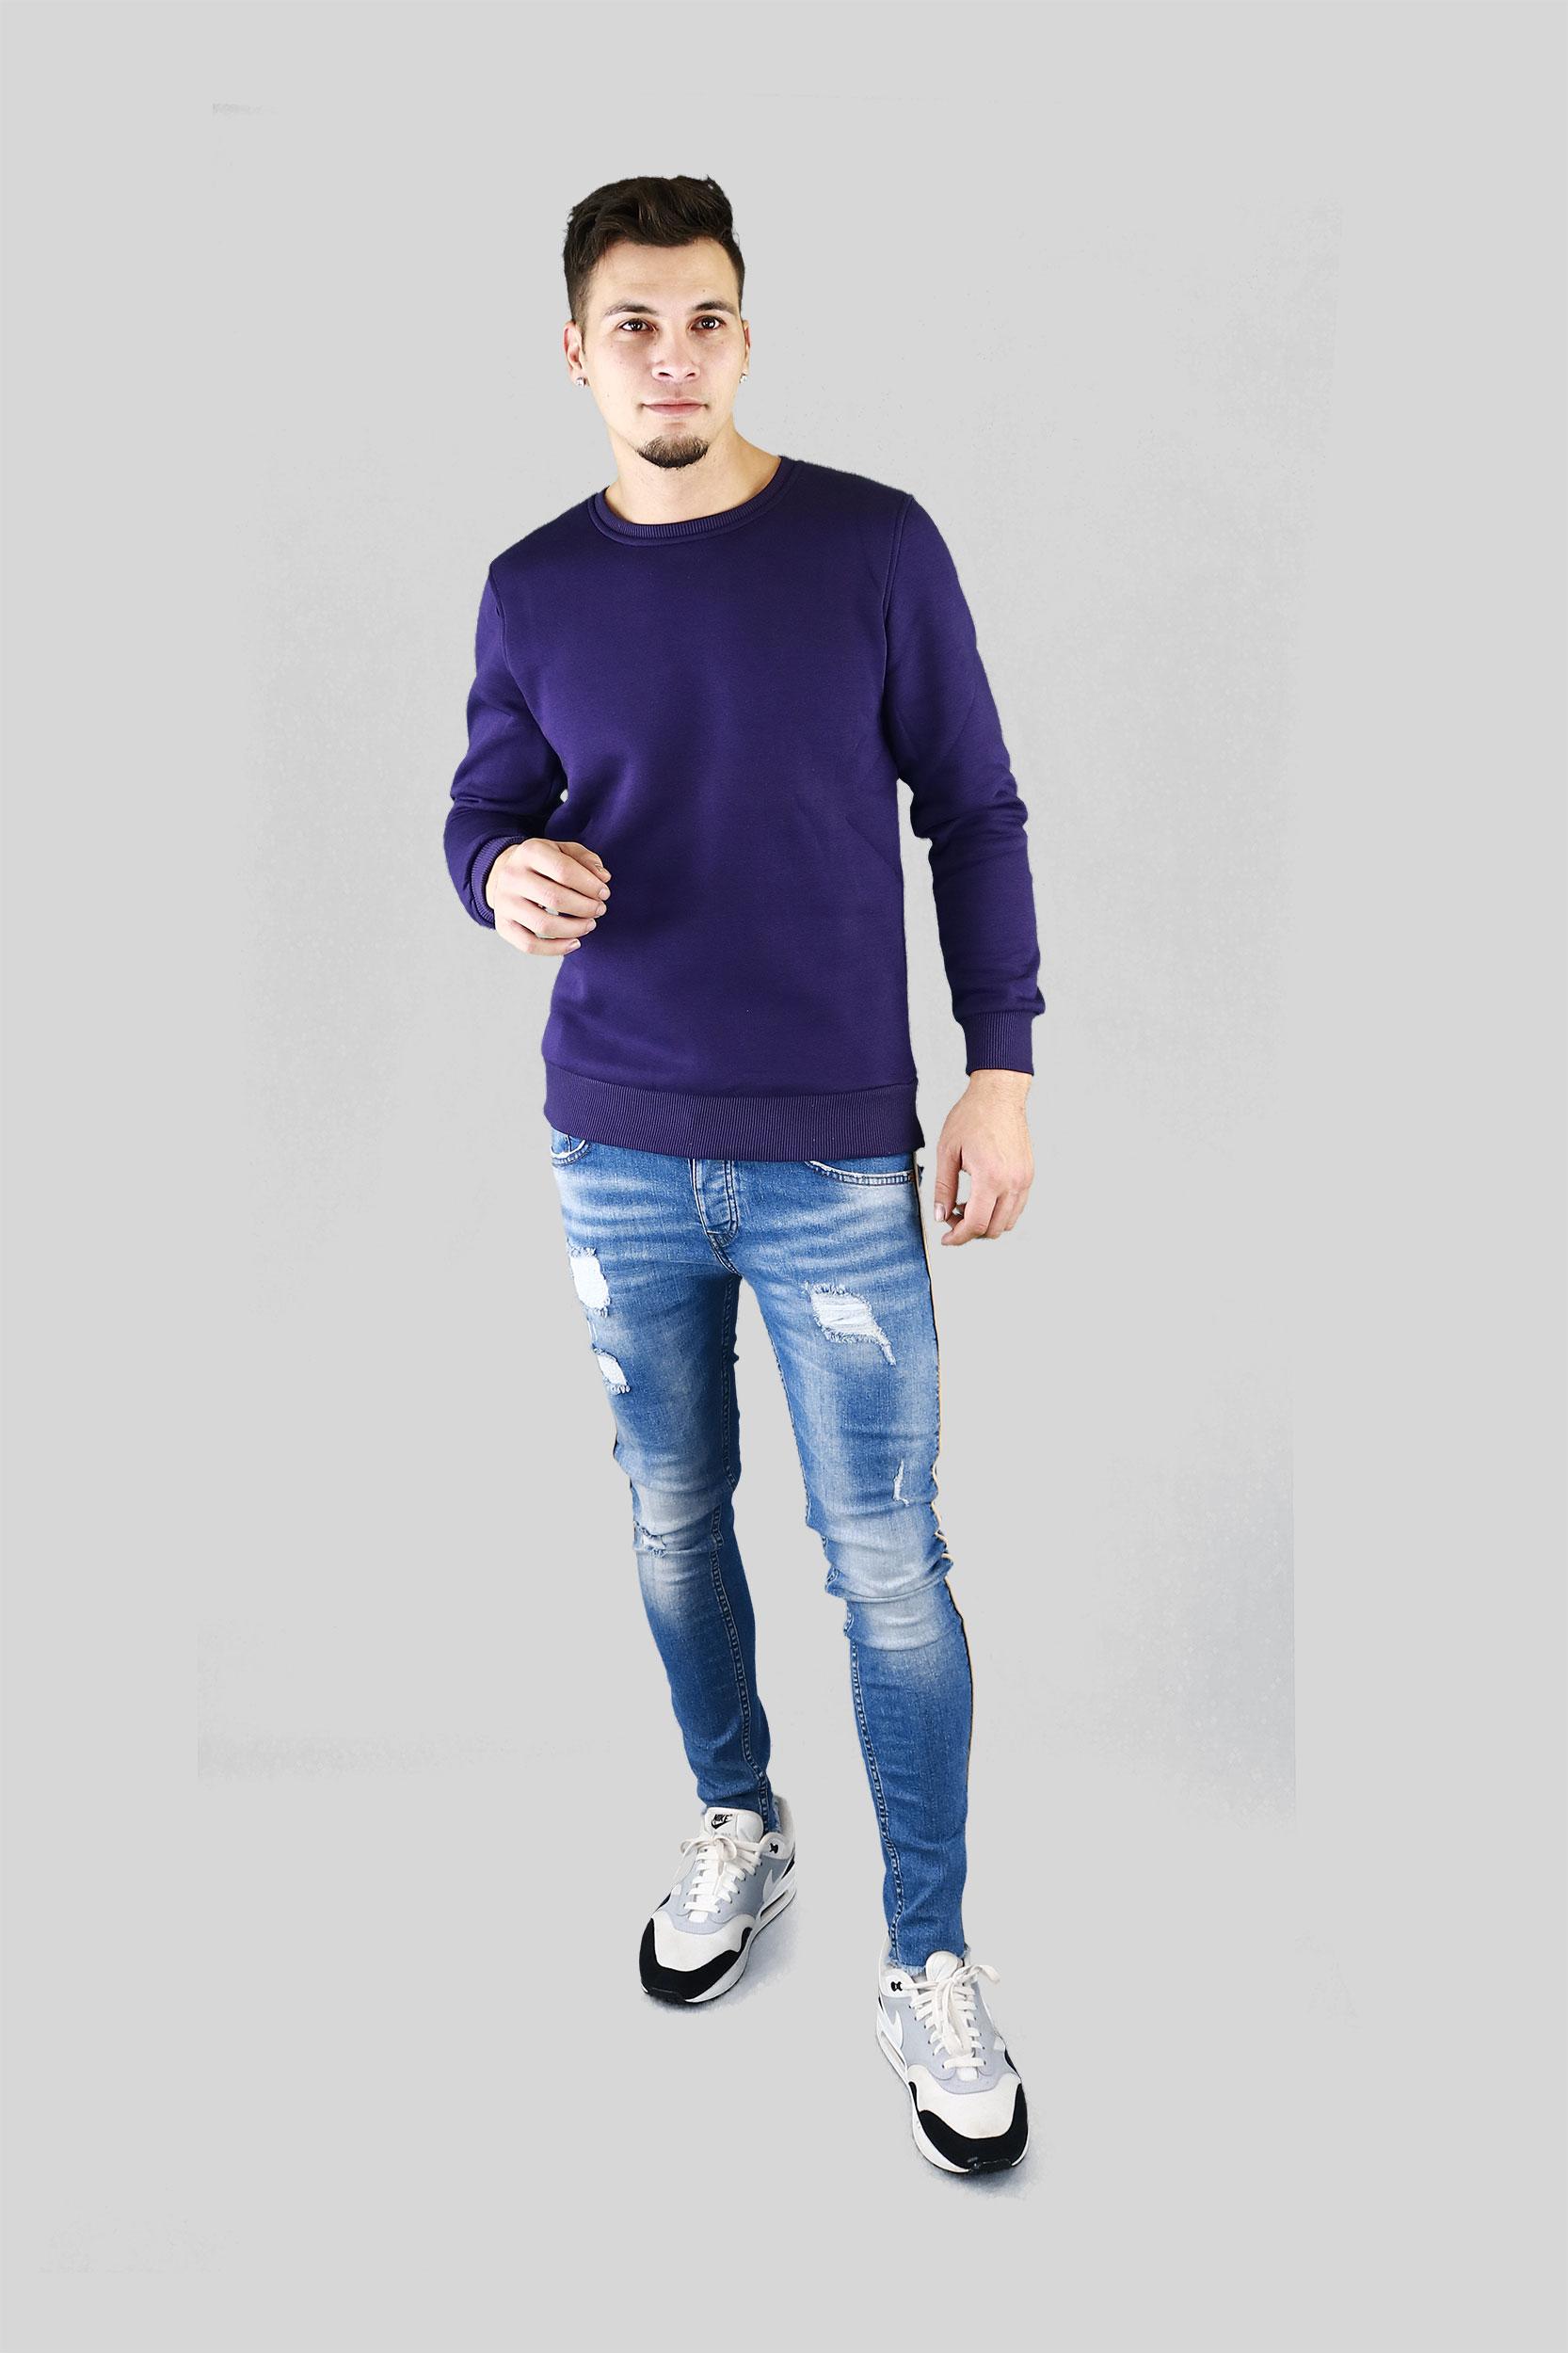 Whish Herenkleding. Sweater basic paars